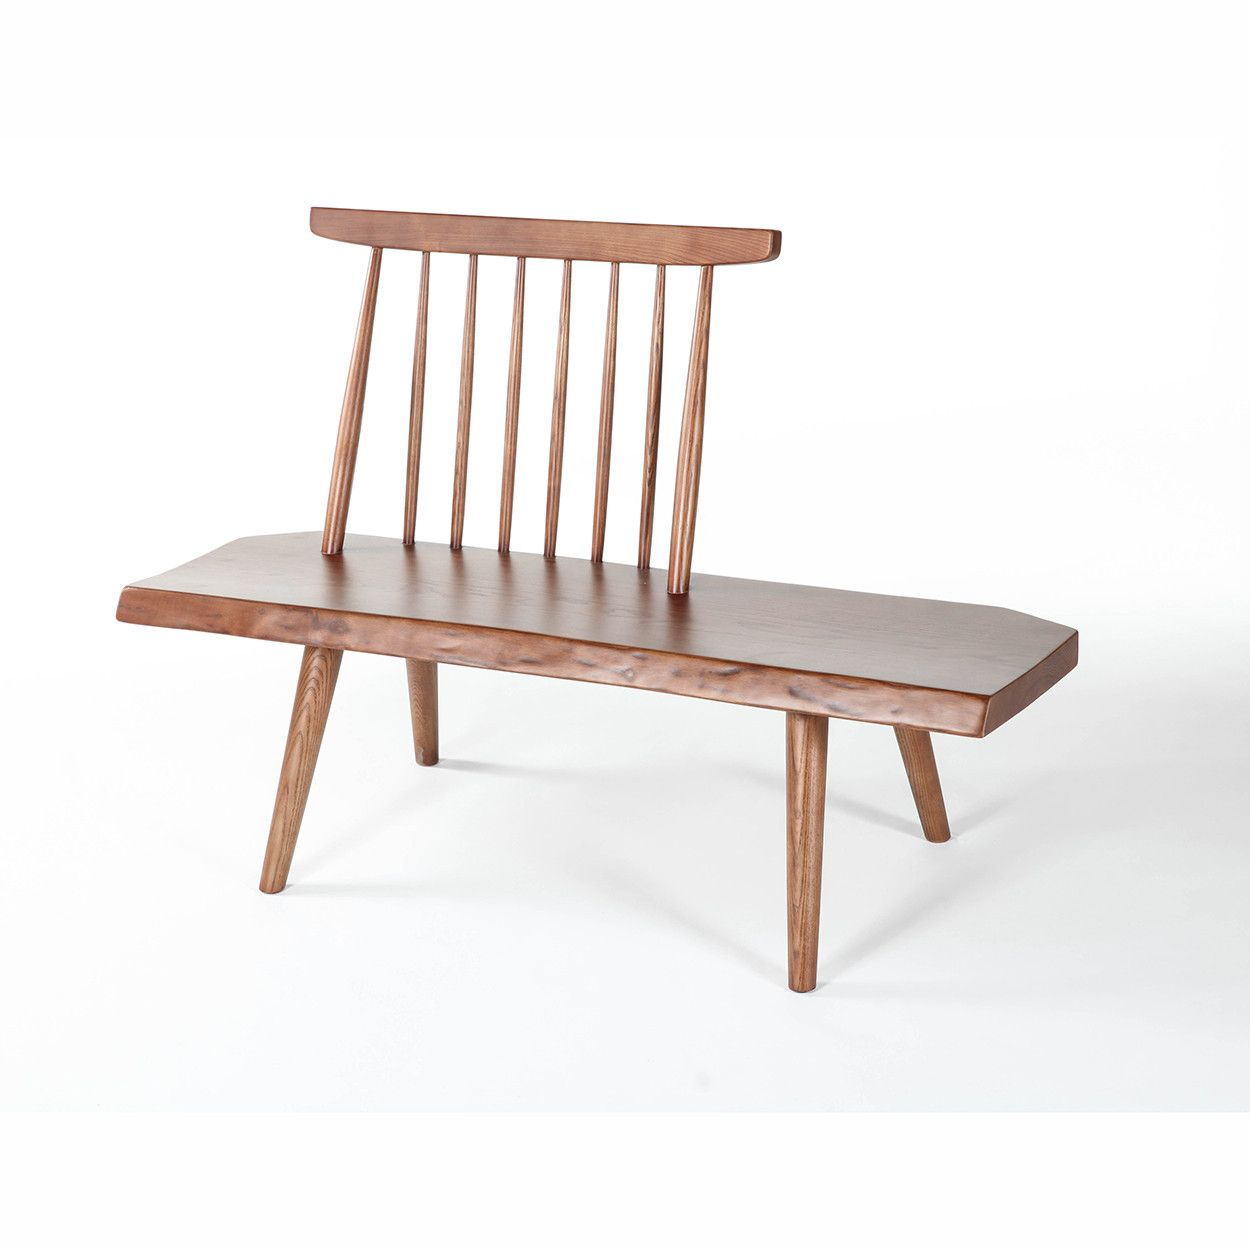 "Mid-Century Modern Reproduction Conoid Bench 50"" Walnut ..."